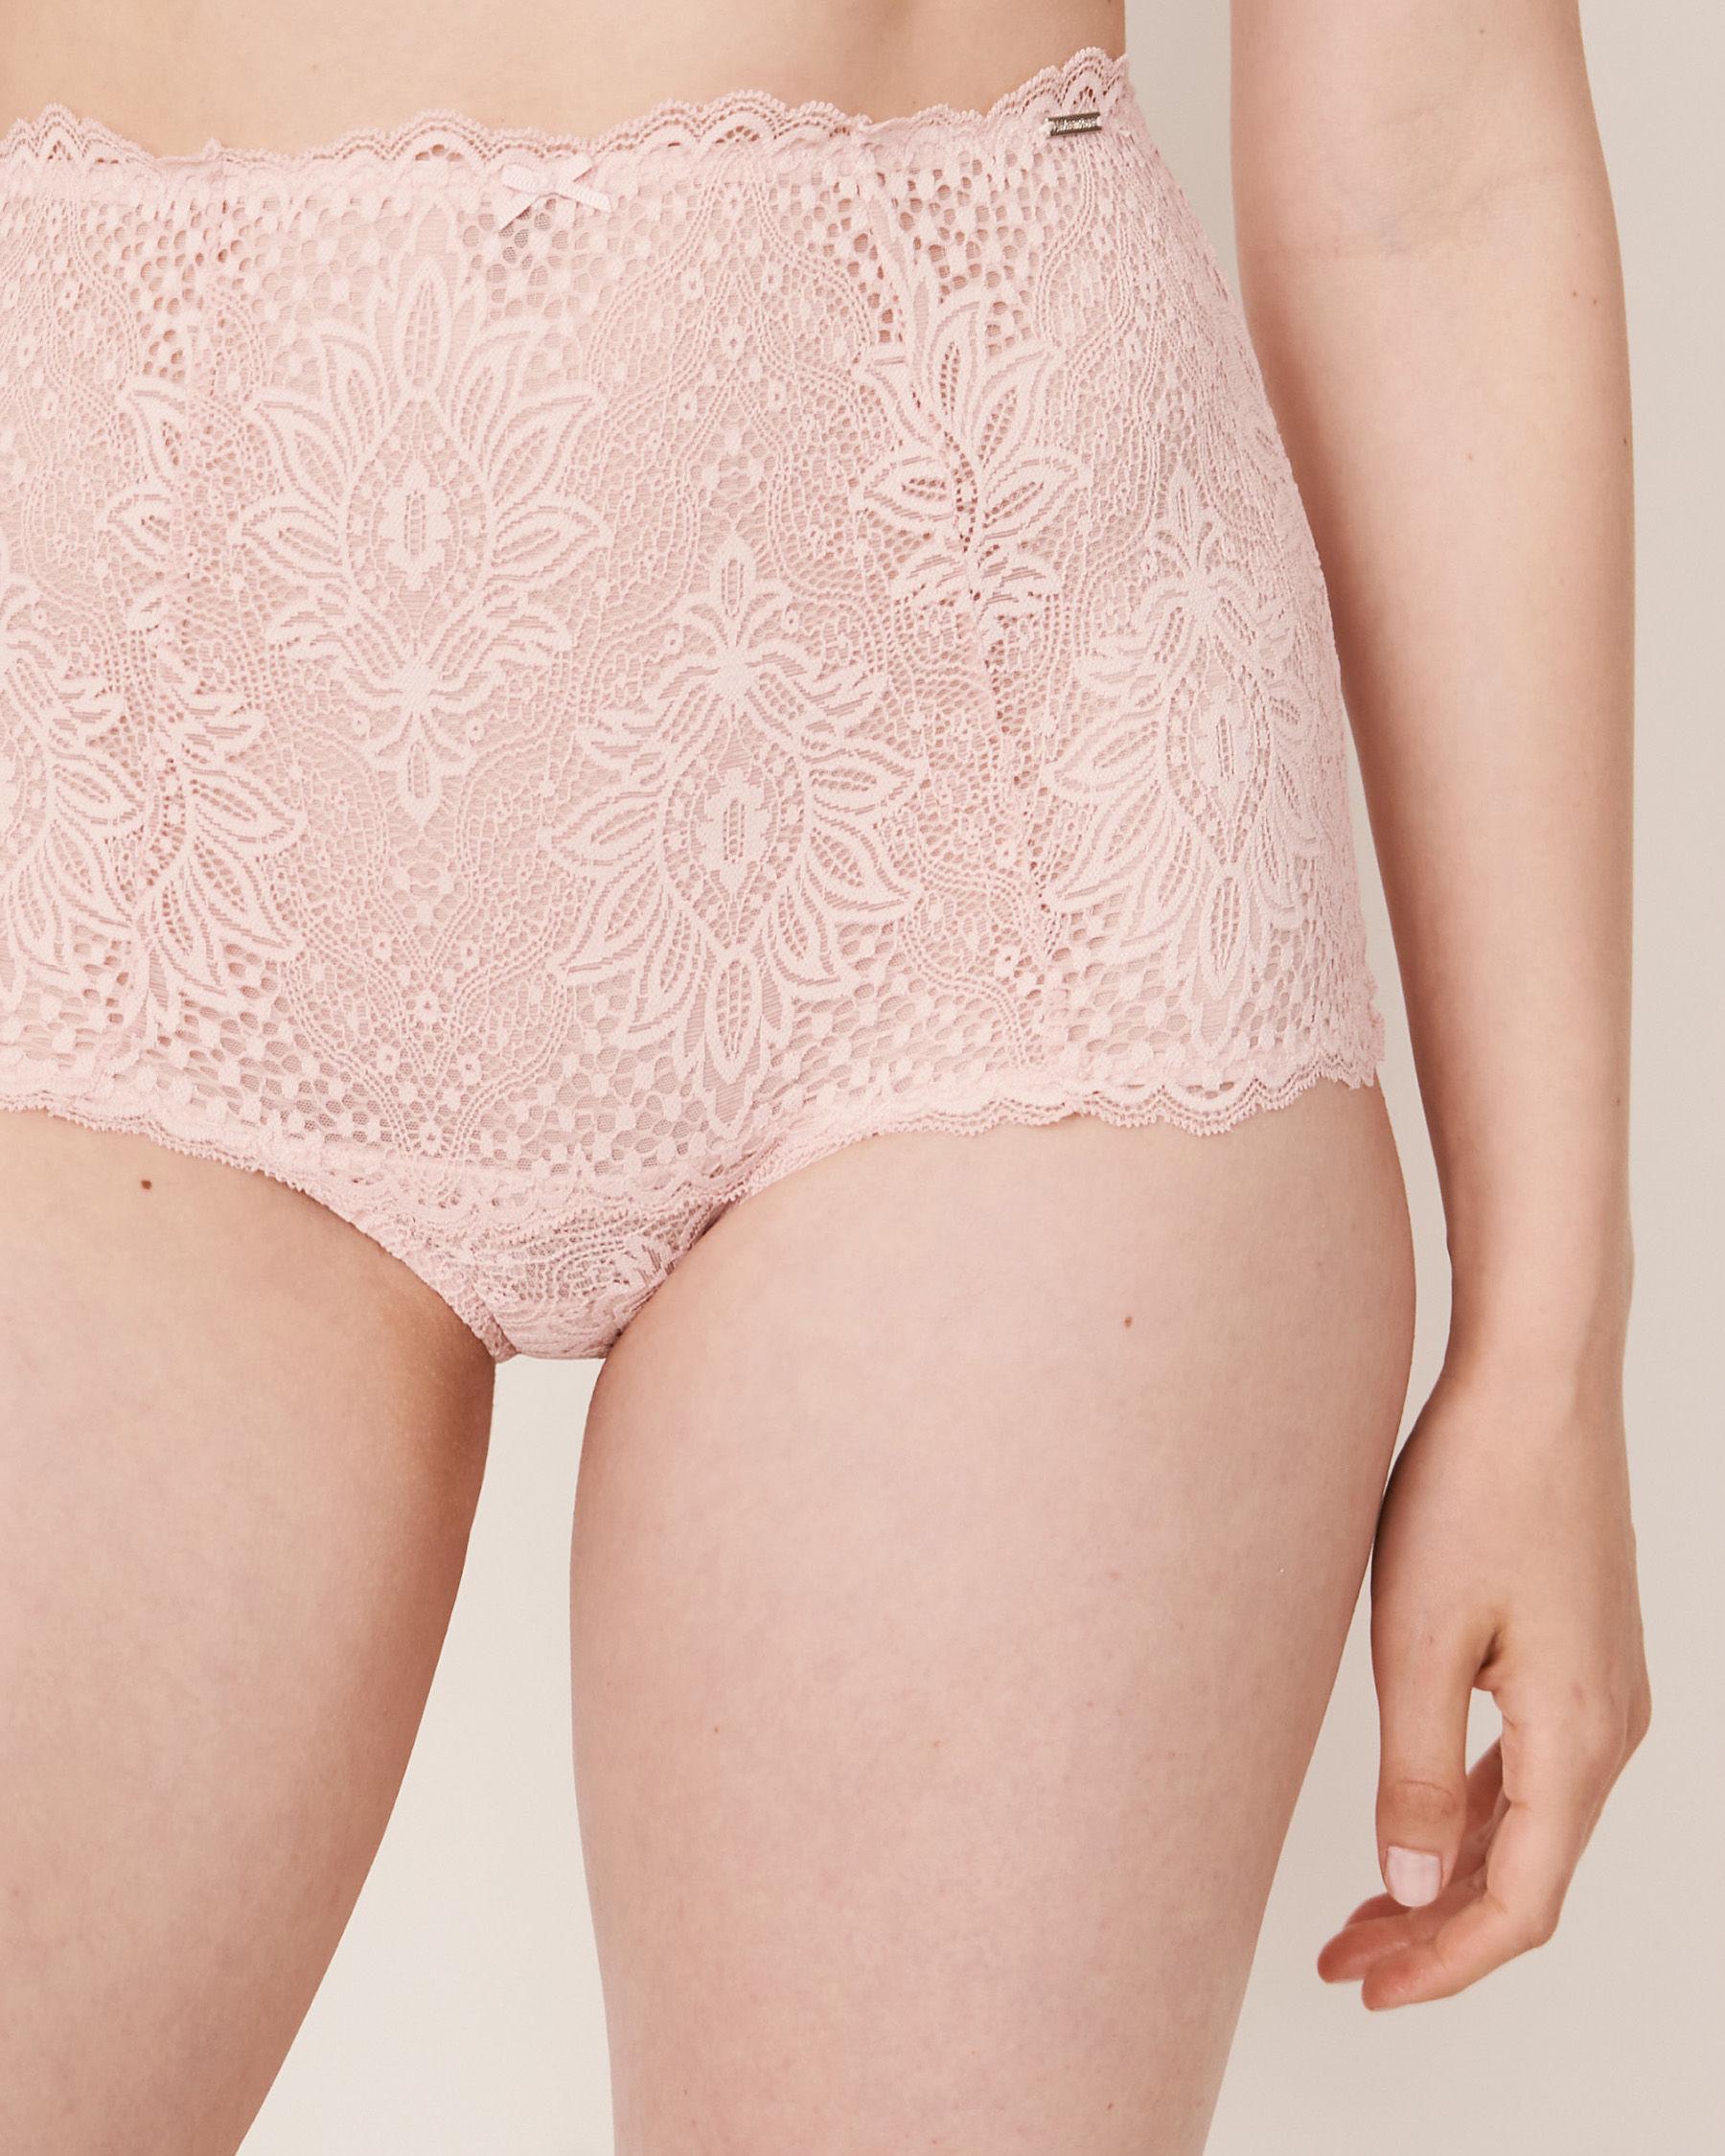 LA VIE EN ROSE Culotte bikini taille haute Rose pâle 20300044 - Voir1